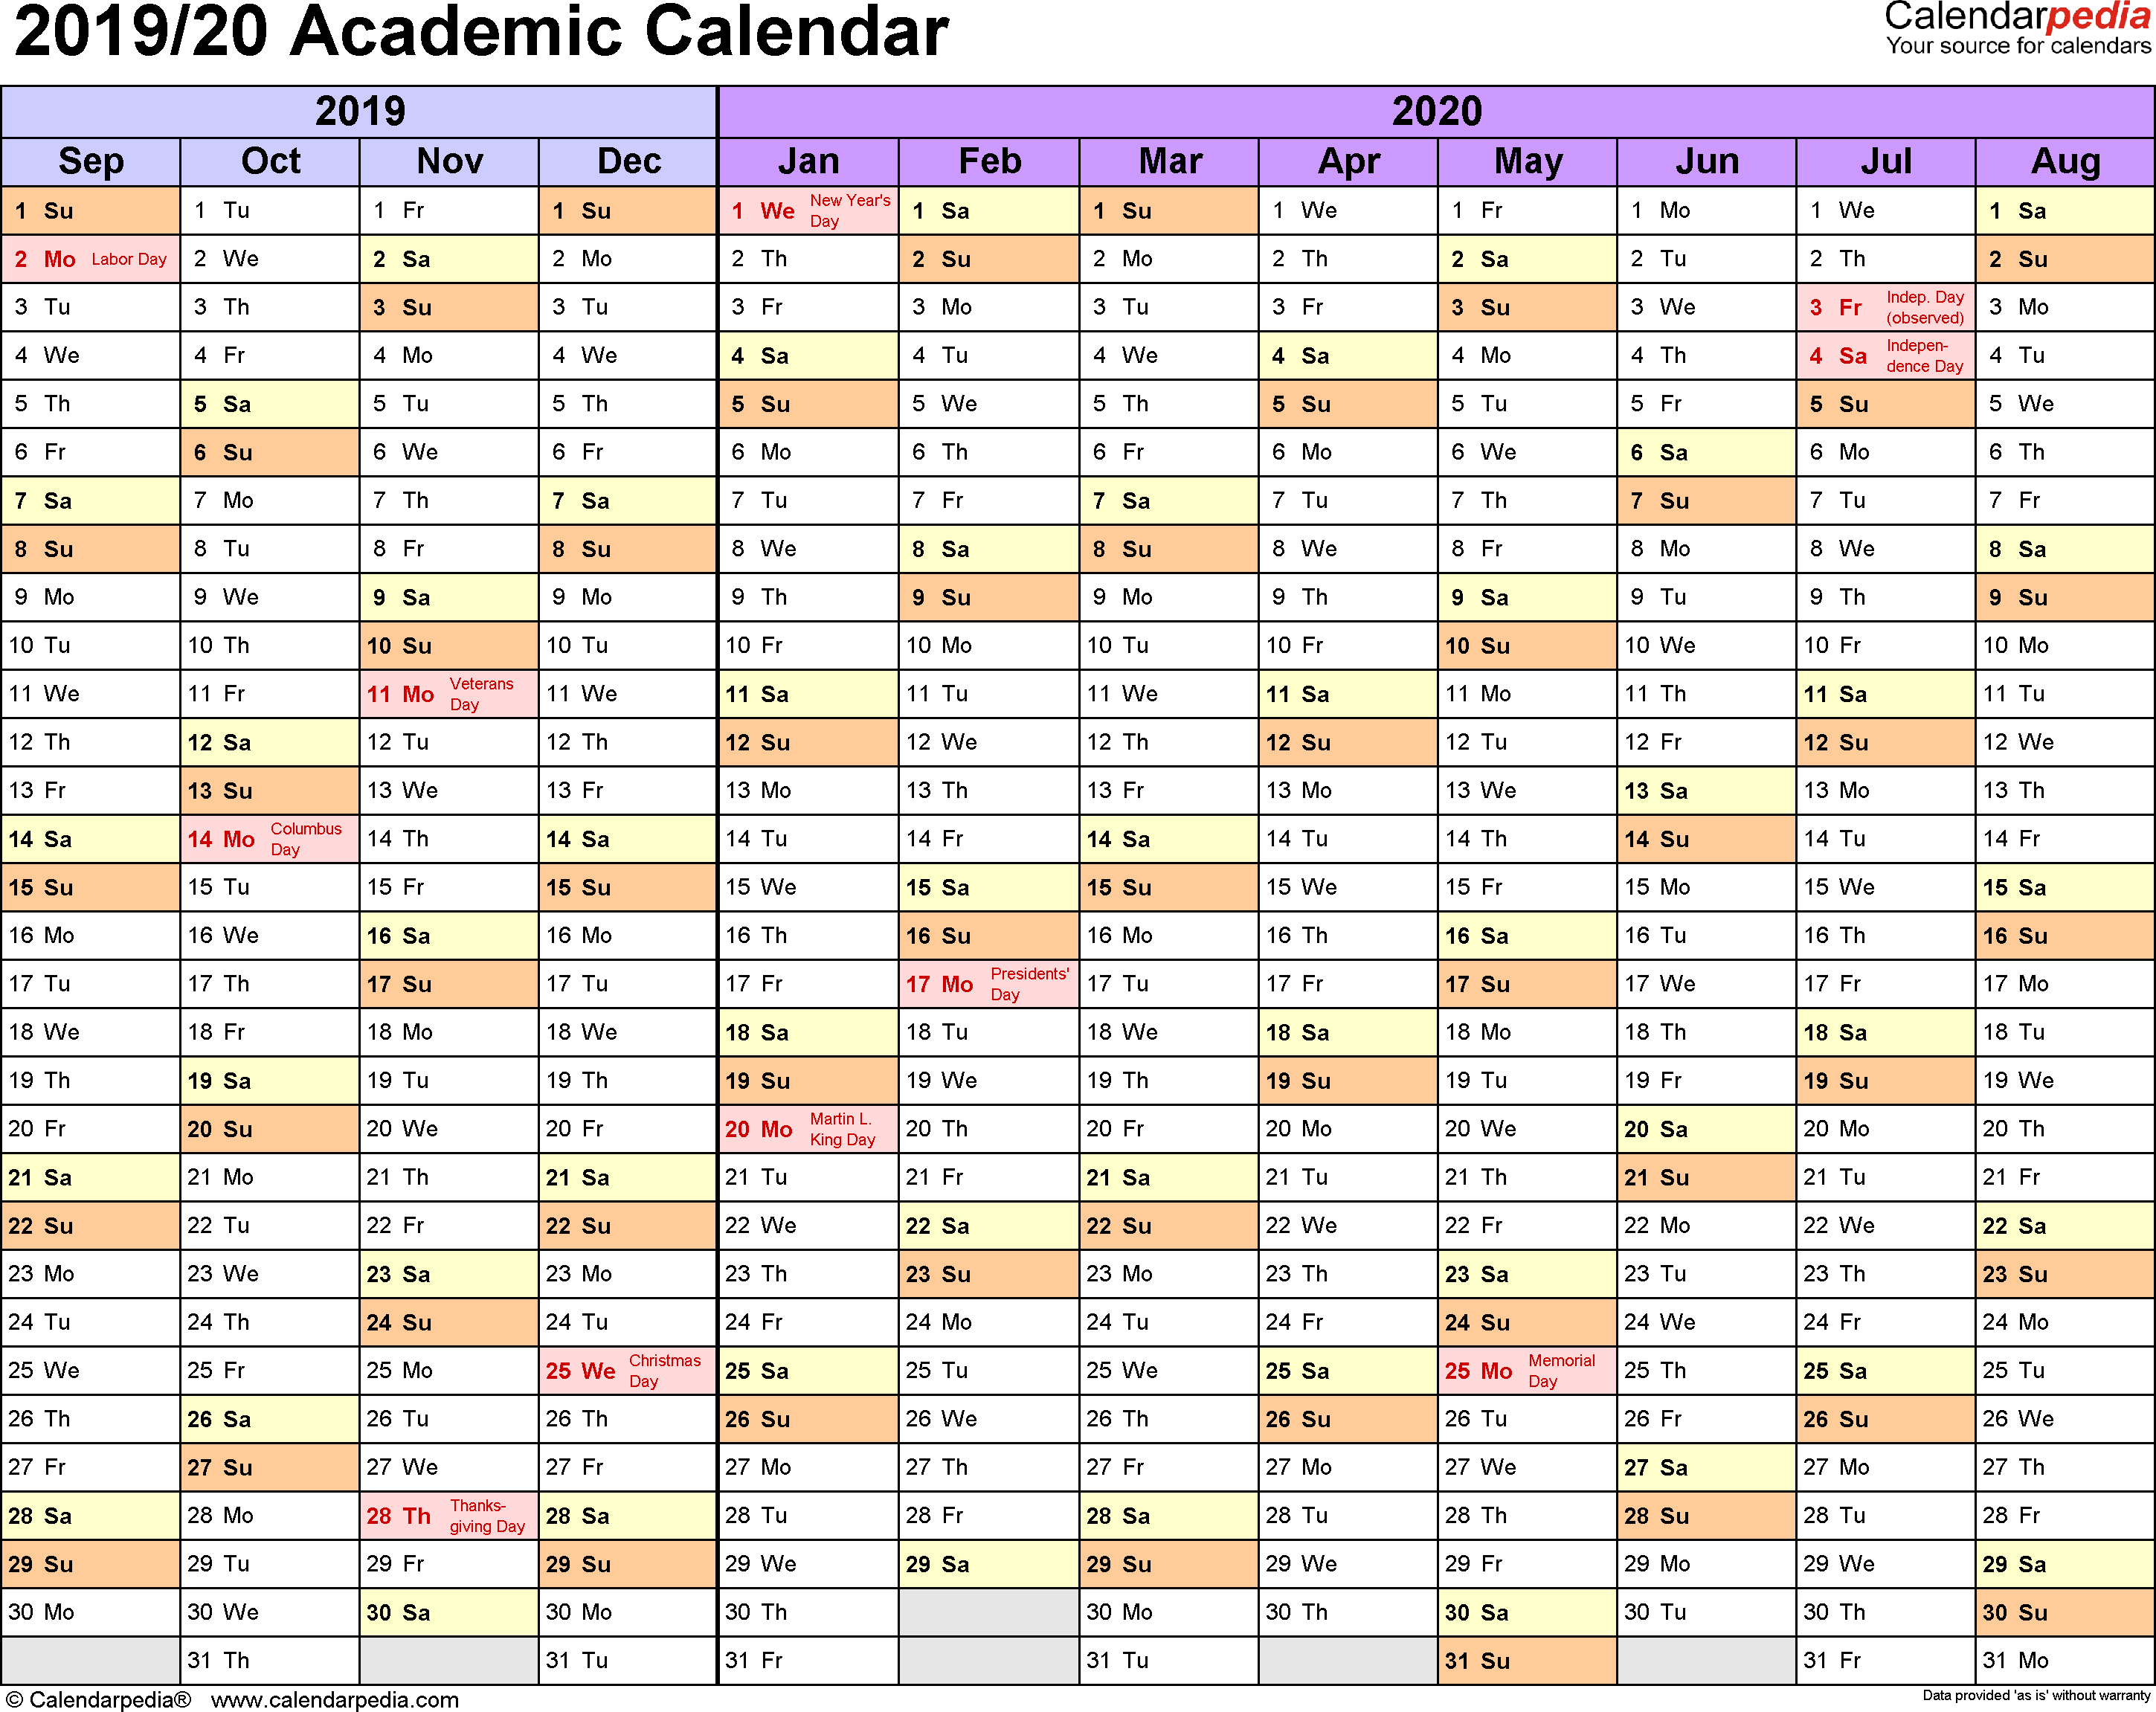 Academic Calendars 2019/2020 - Free Printable Pdf Templates